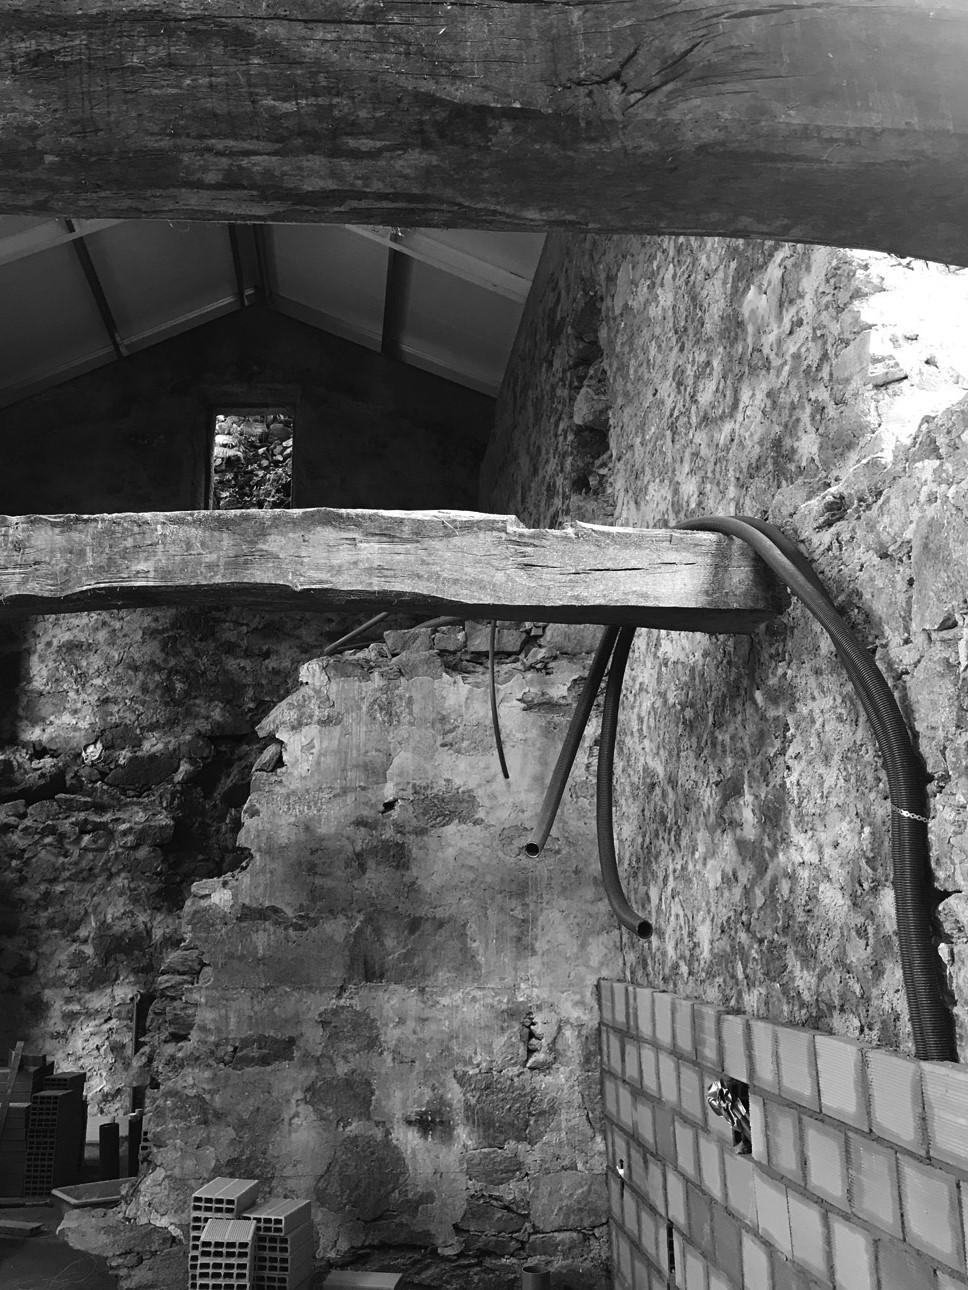 Moradia Folgorosa - Vale de Cambra - EVA atelier - Arquitectura - Obra - Arquitecto - Porto - EVA evolutionary architecture (3).jpg